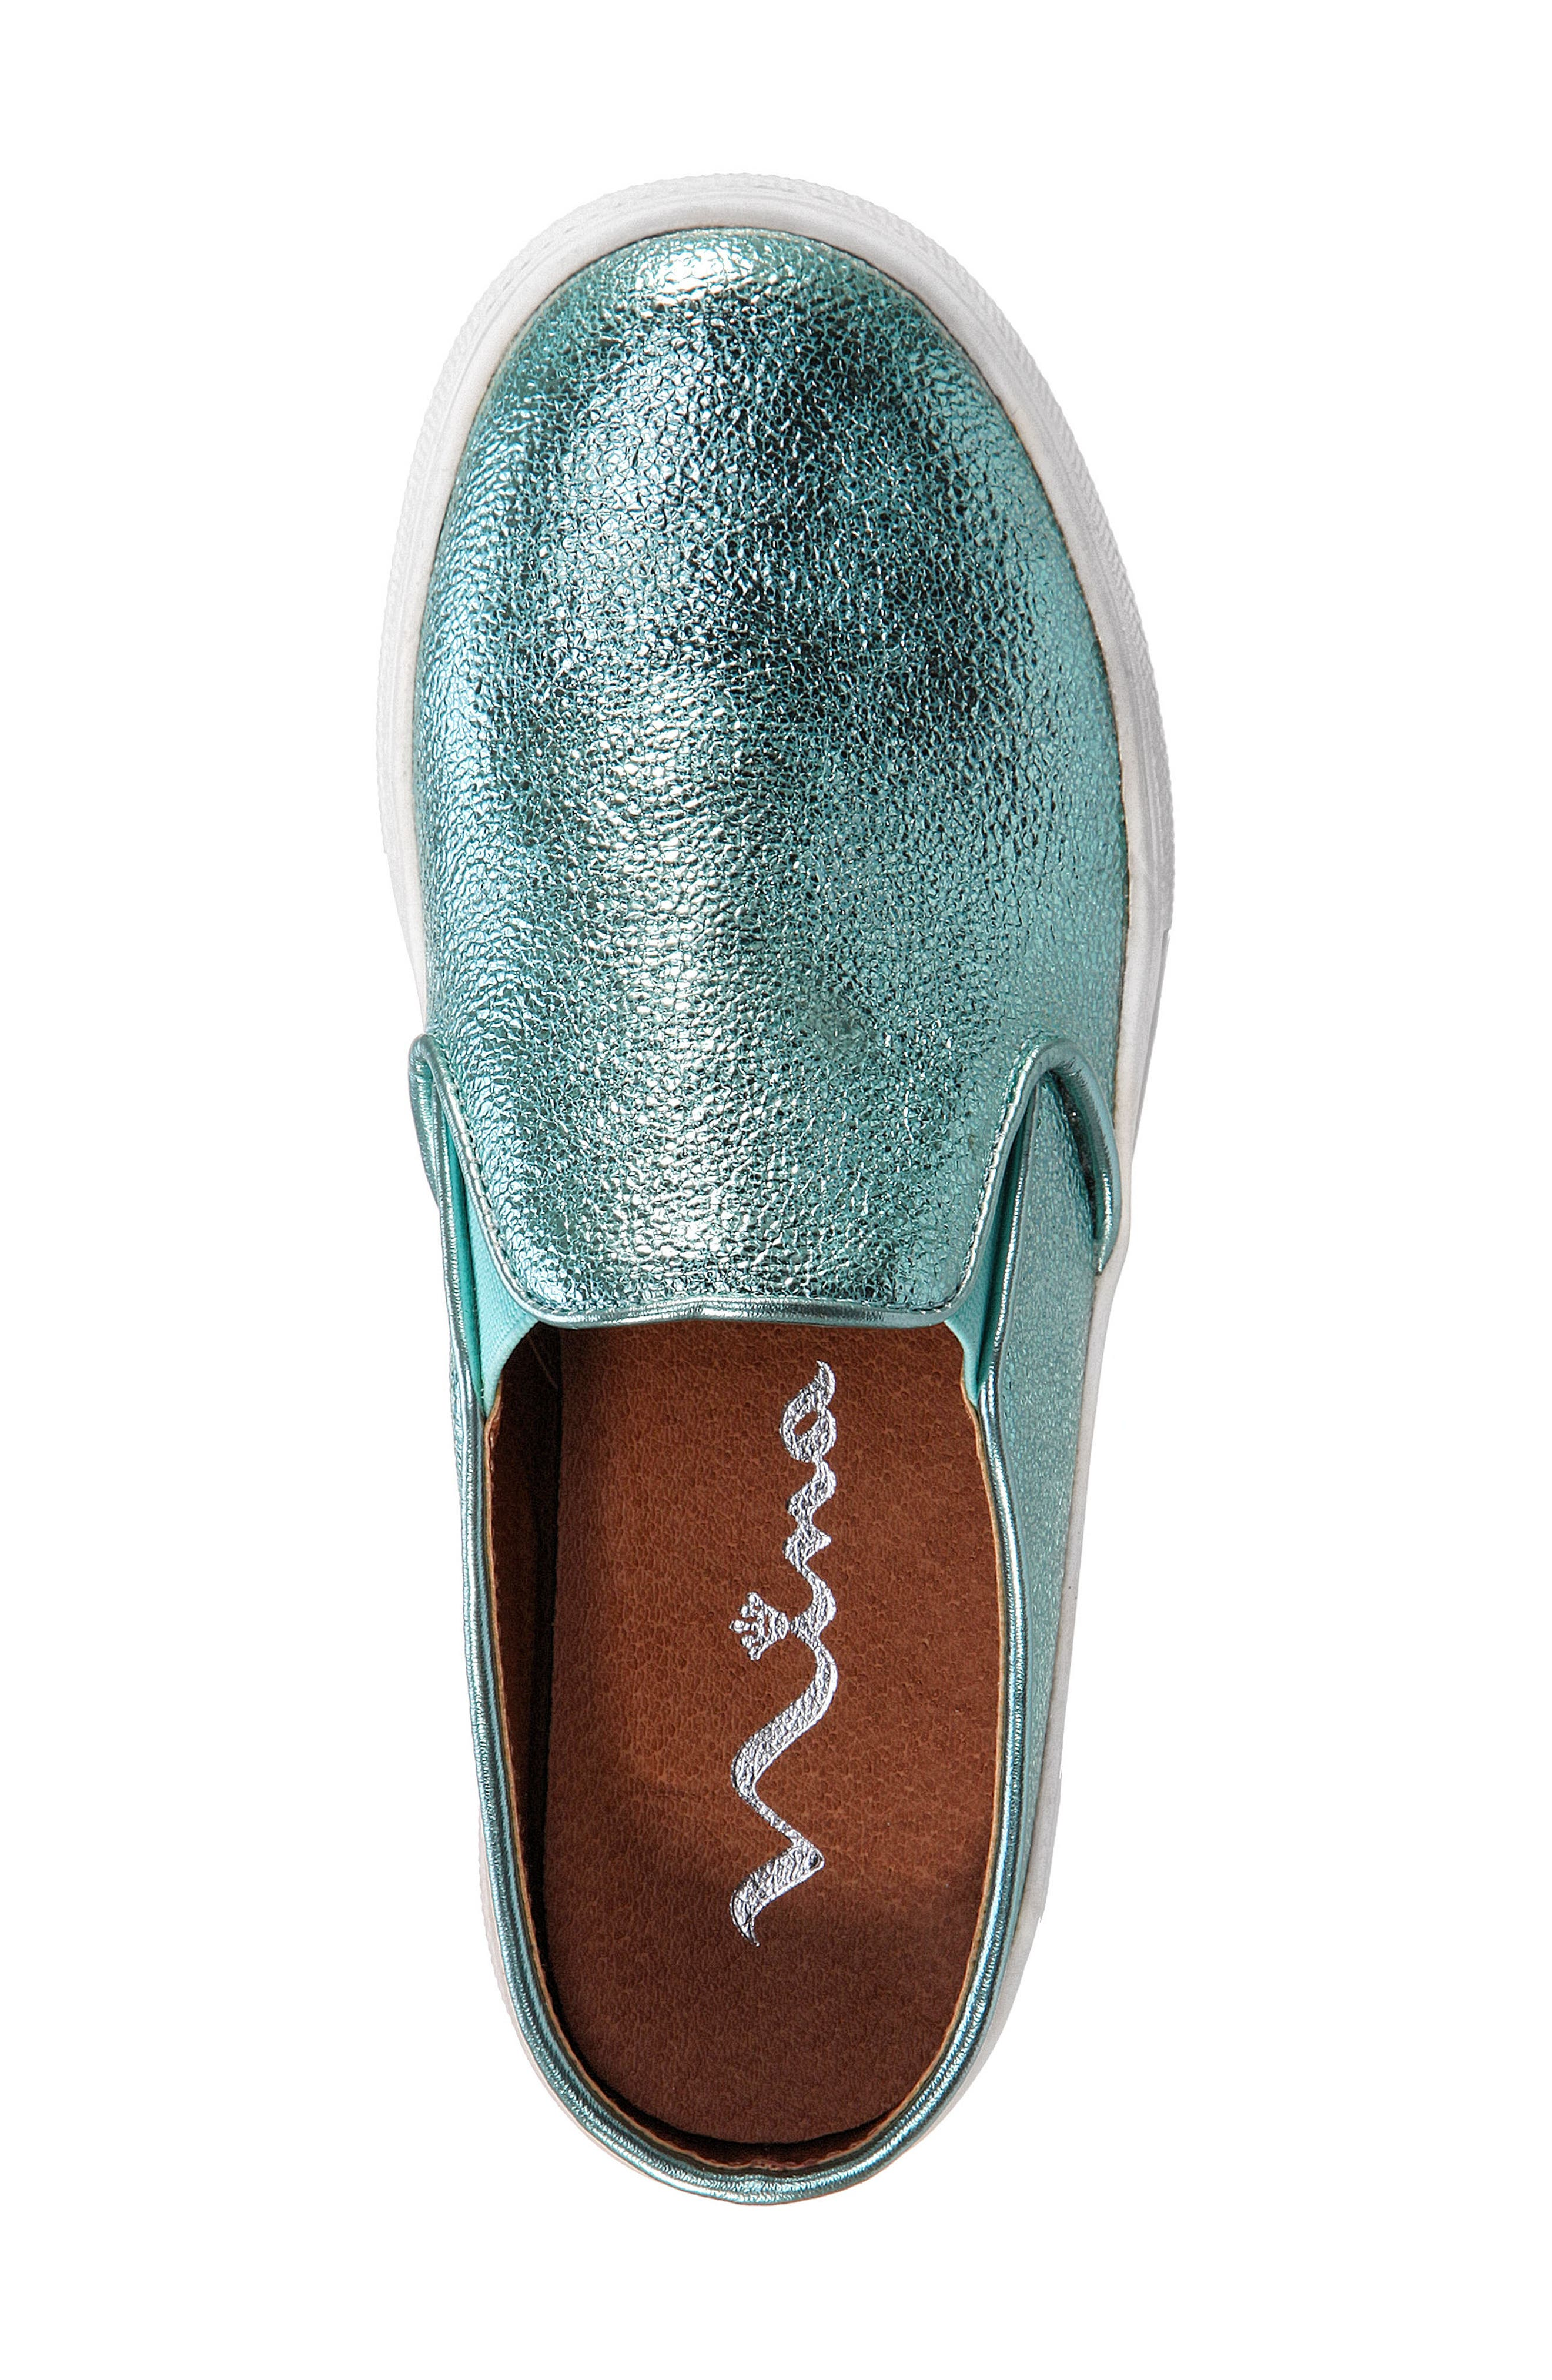 Gail Metallic Slip-On Sneaker Mule,                             Alternate thumbnail 14, color,